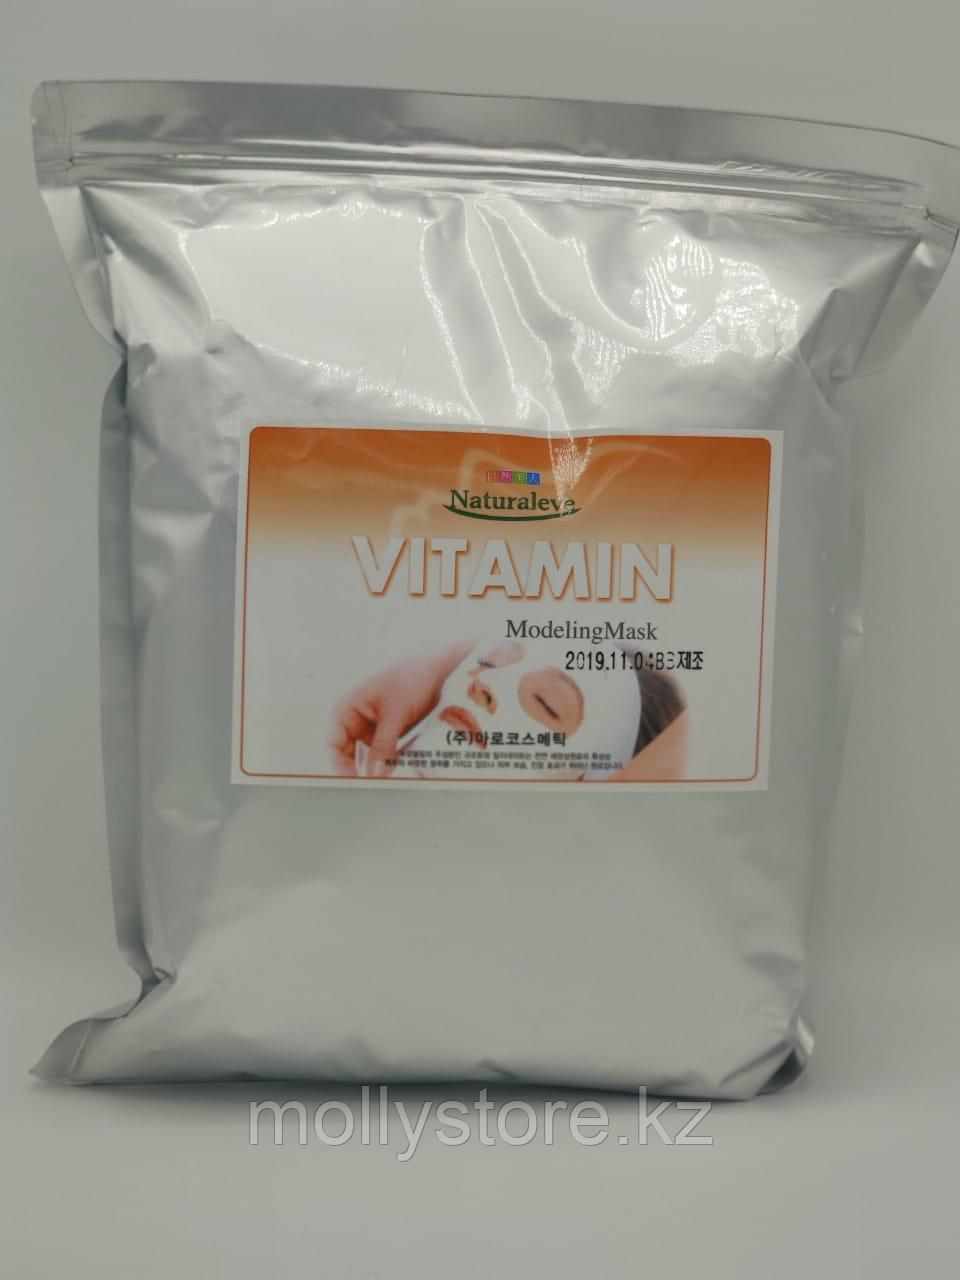 Витаминная альгинатная маска (VITAMIN MODELING MASK) 1 кг